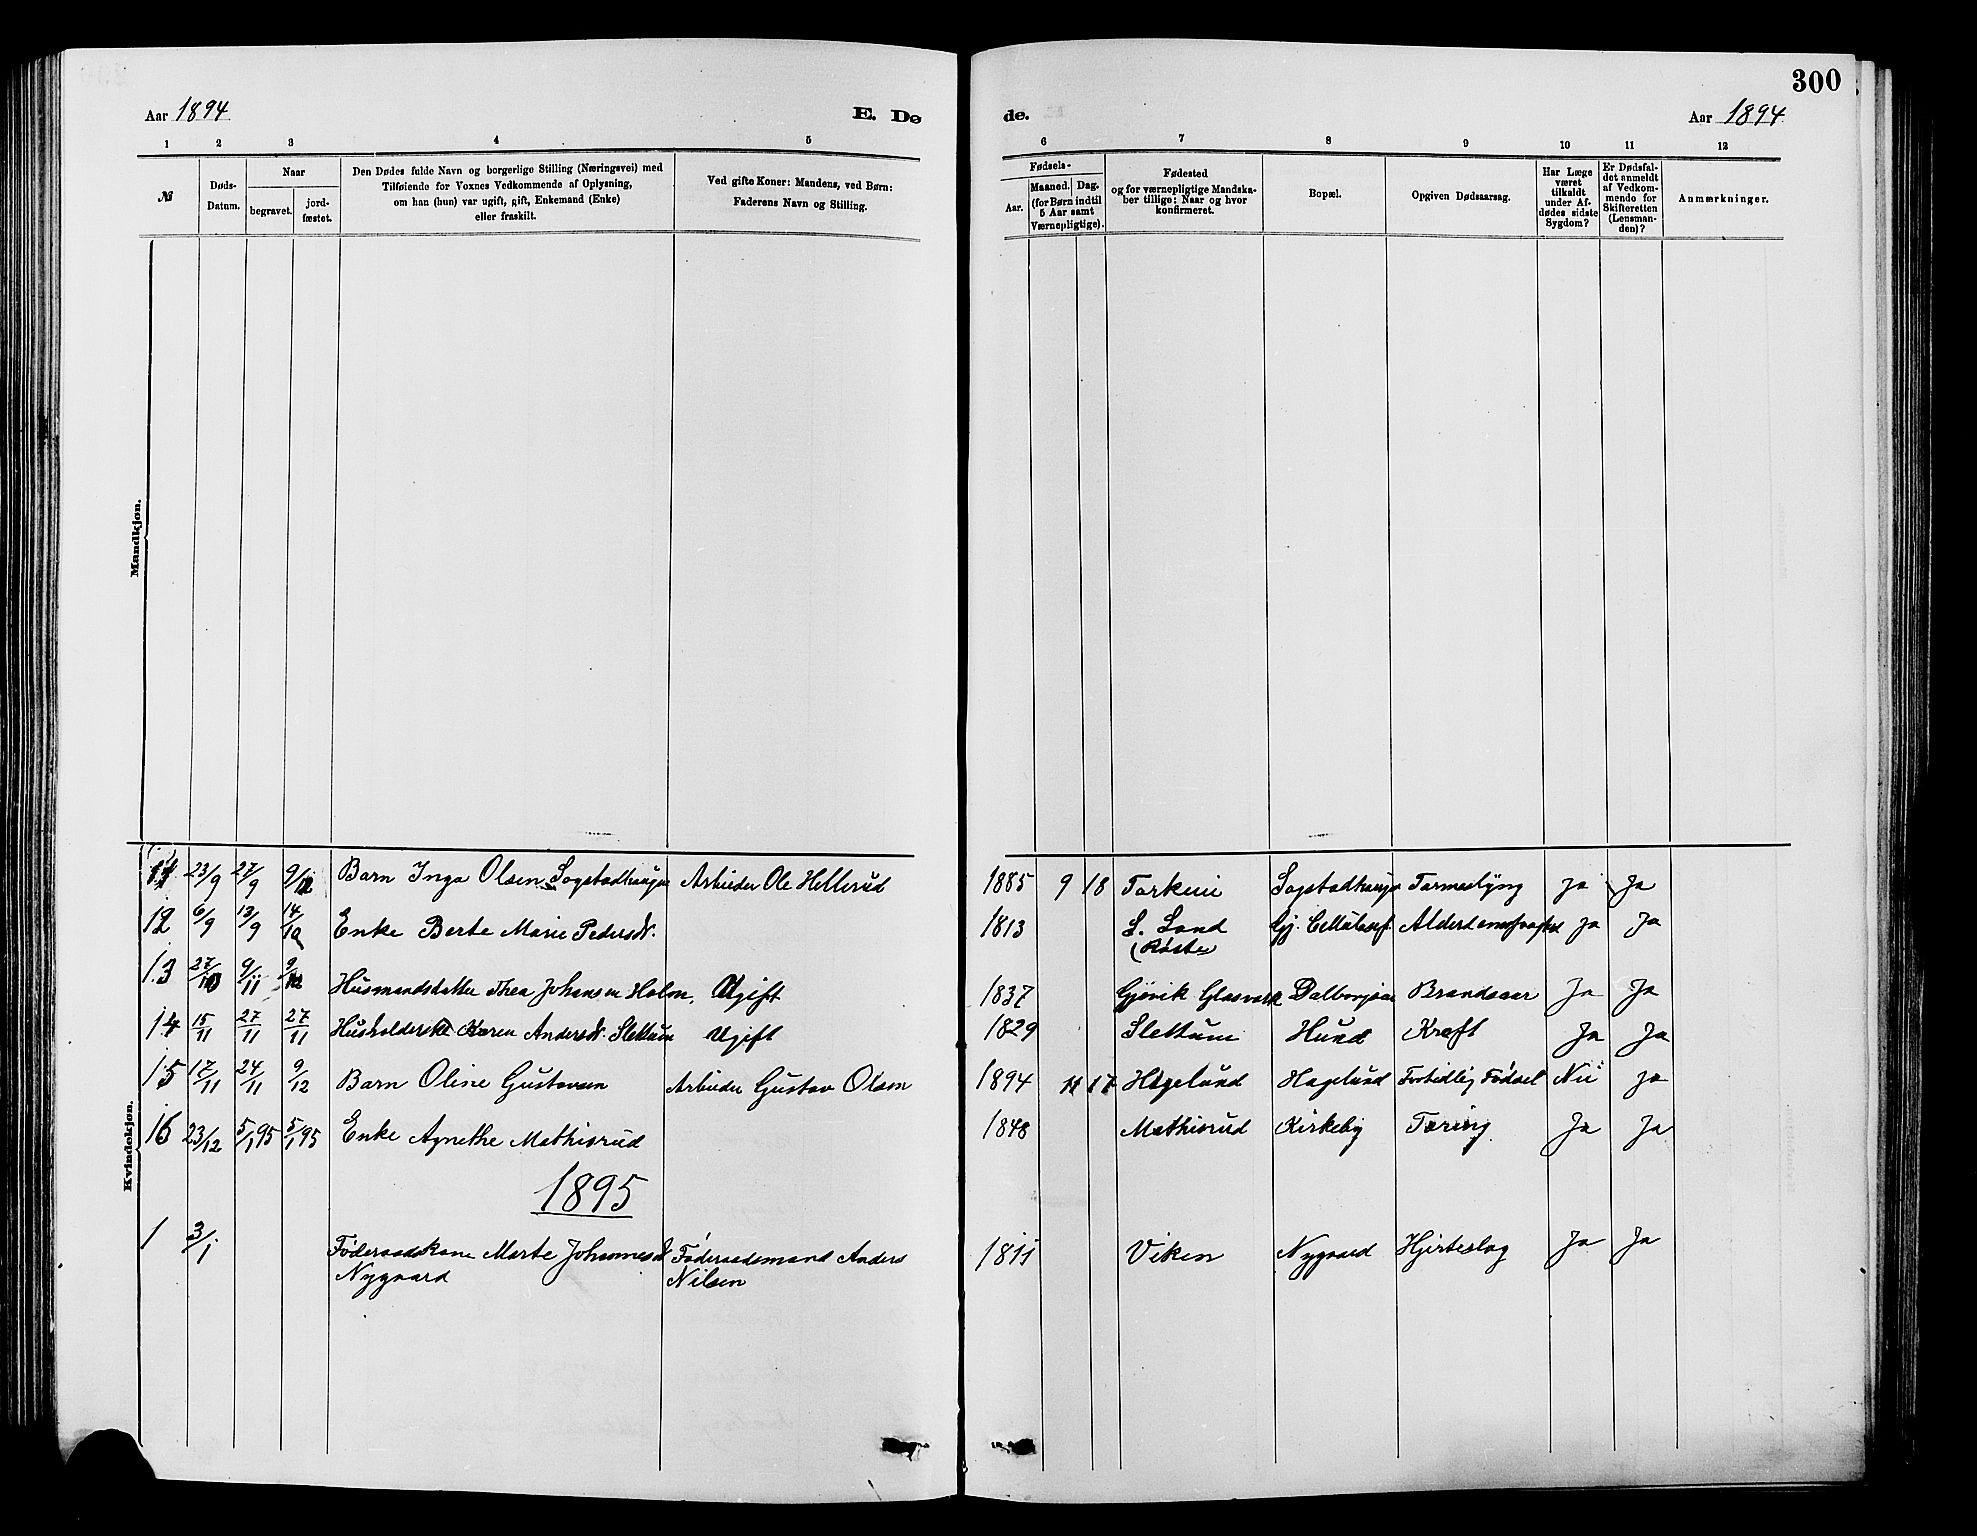 SAH, Vardal prestekontor, H/Ha/Hab/L0007: Klokkerbok nr. 7 /1, 1881-1895, s. 300